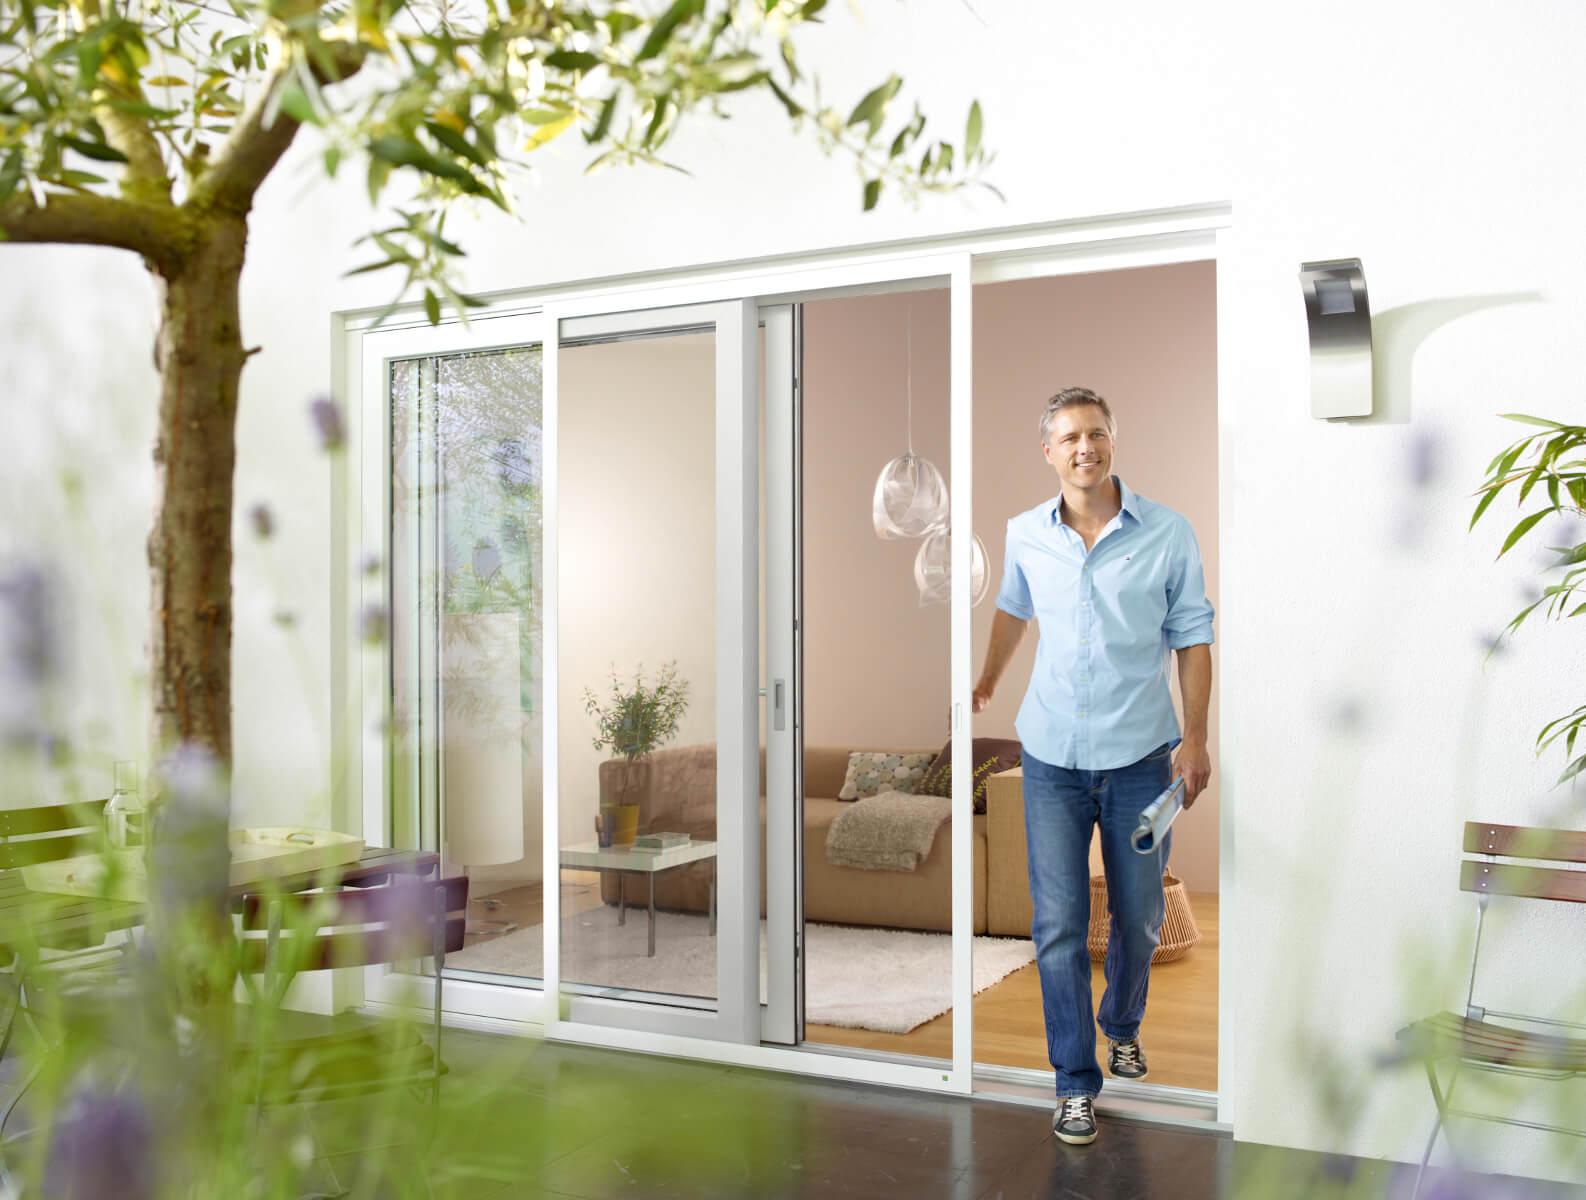 fliegengitter insektenschutz f r fenster t ren dachfenster. Black Bedroom Furniture Sets. Home Design Ideas